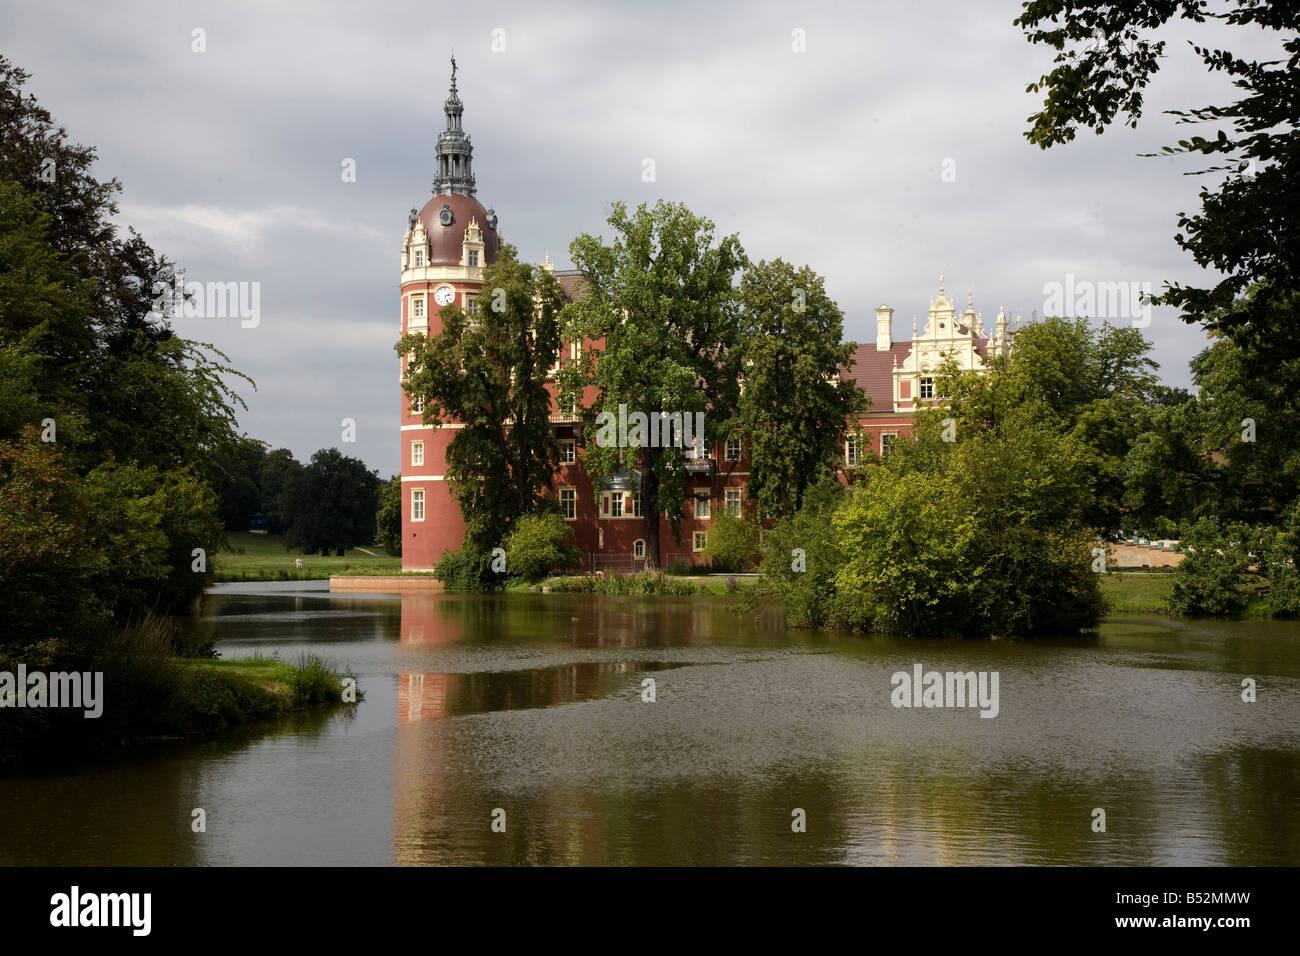 Bad Muskau, Landschaftspark (Park Muzakowski), Neues Schloß Stock Photo